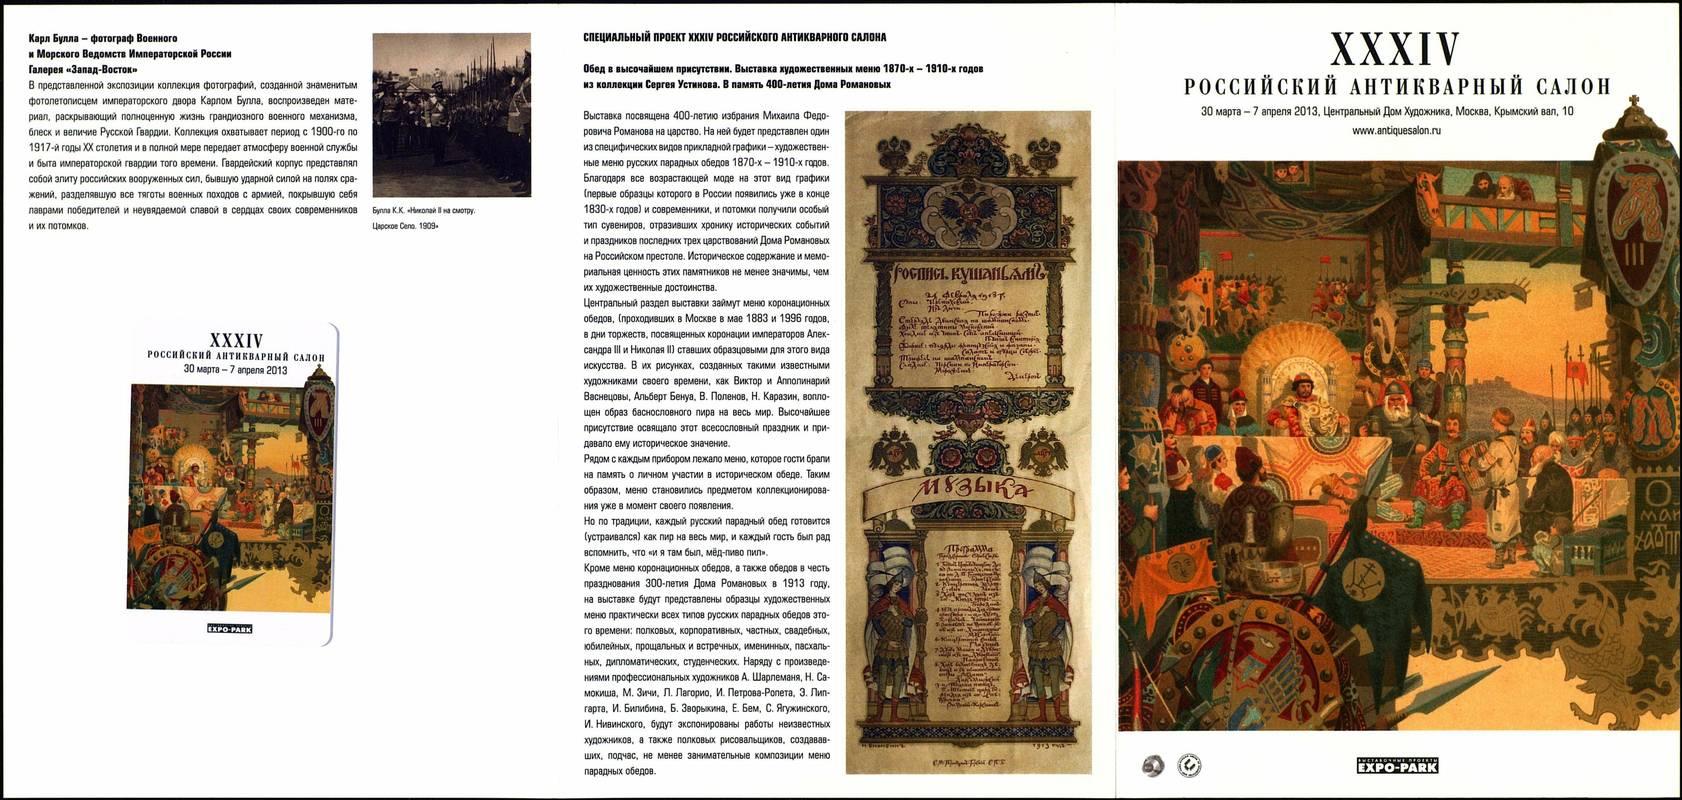 XXXIV Российский антикварный салон